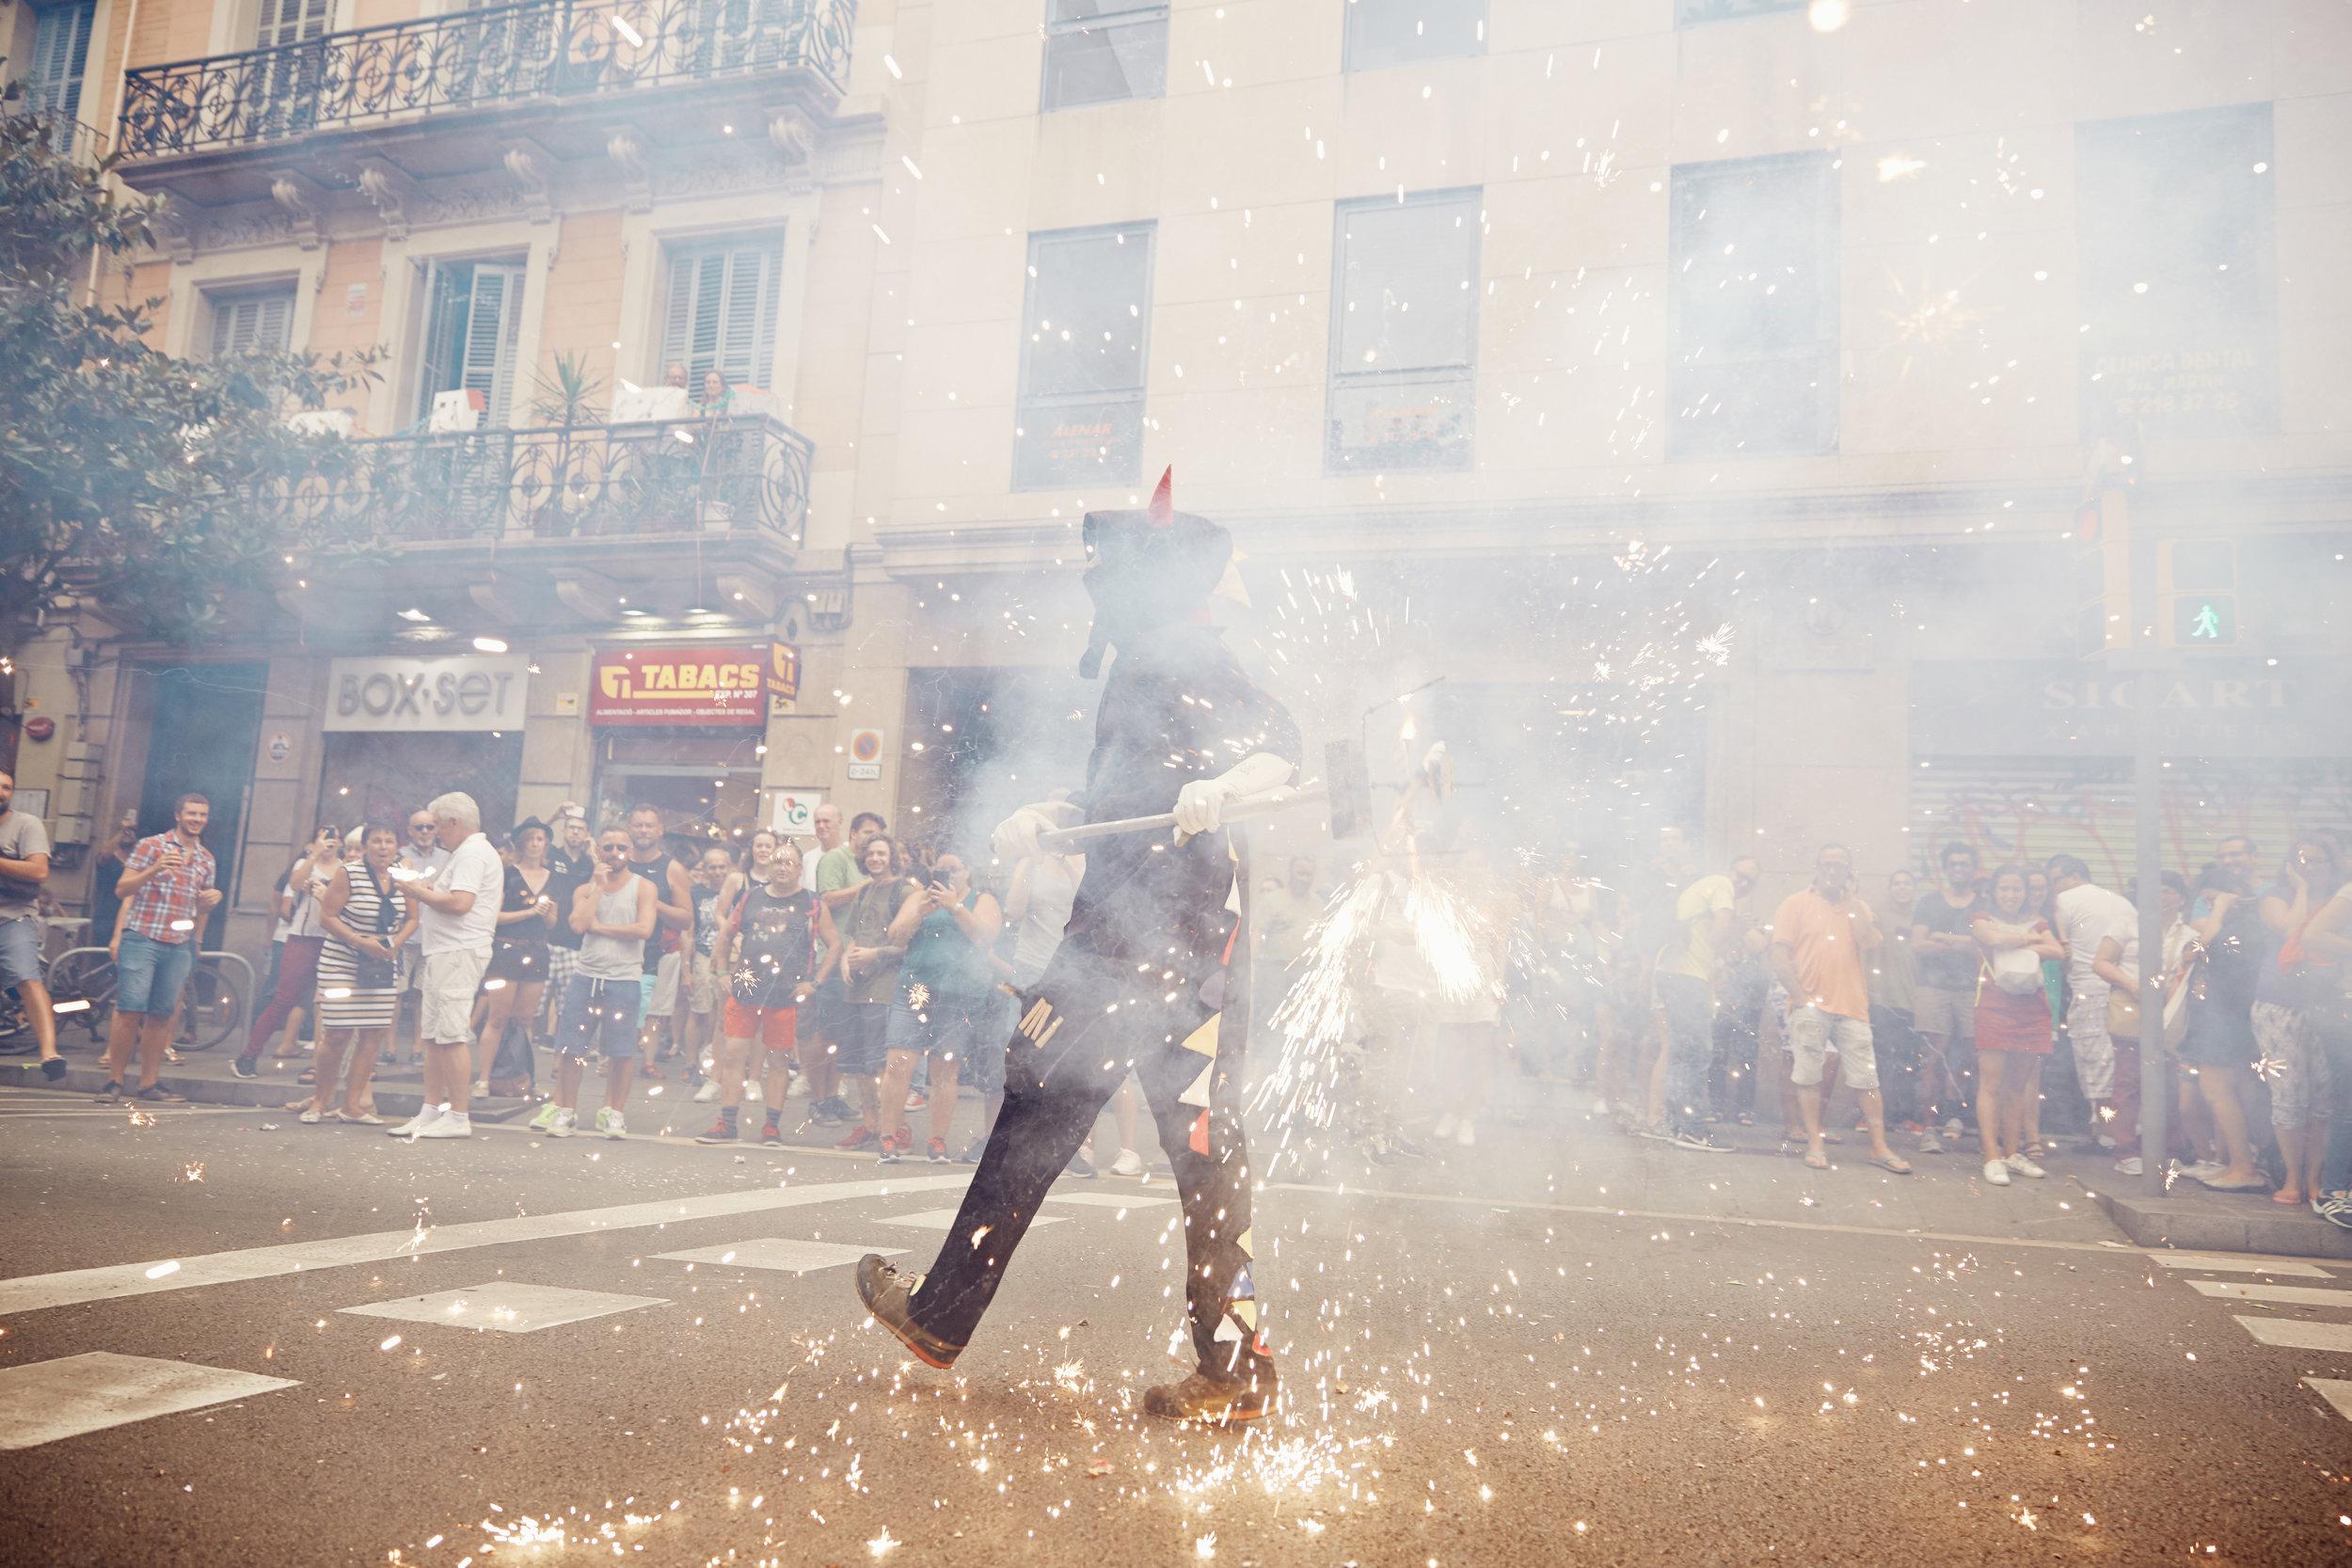 Barcelona_2017_AdamDillon_4F8A2799.jpg